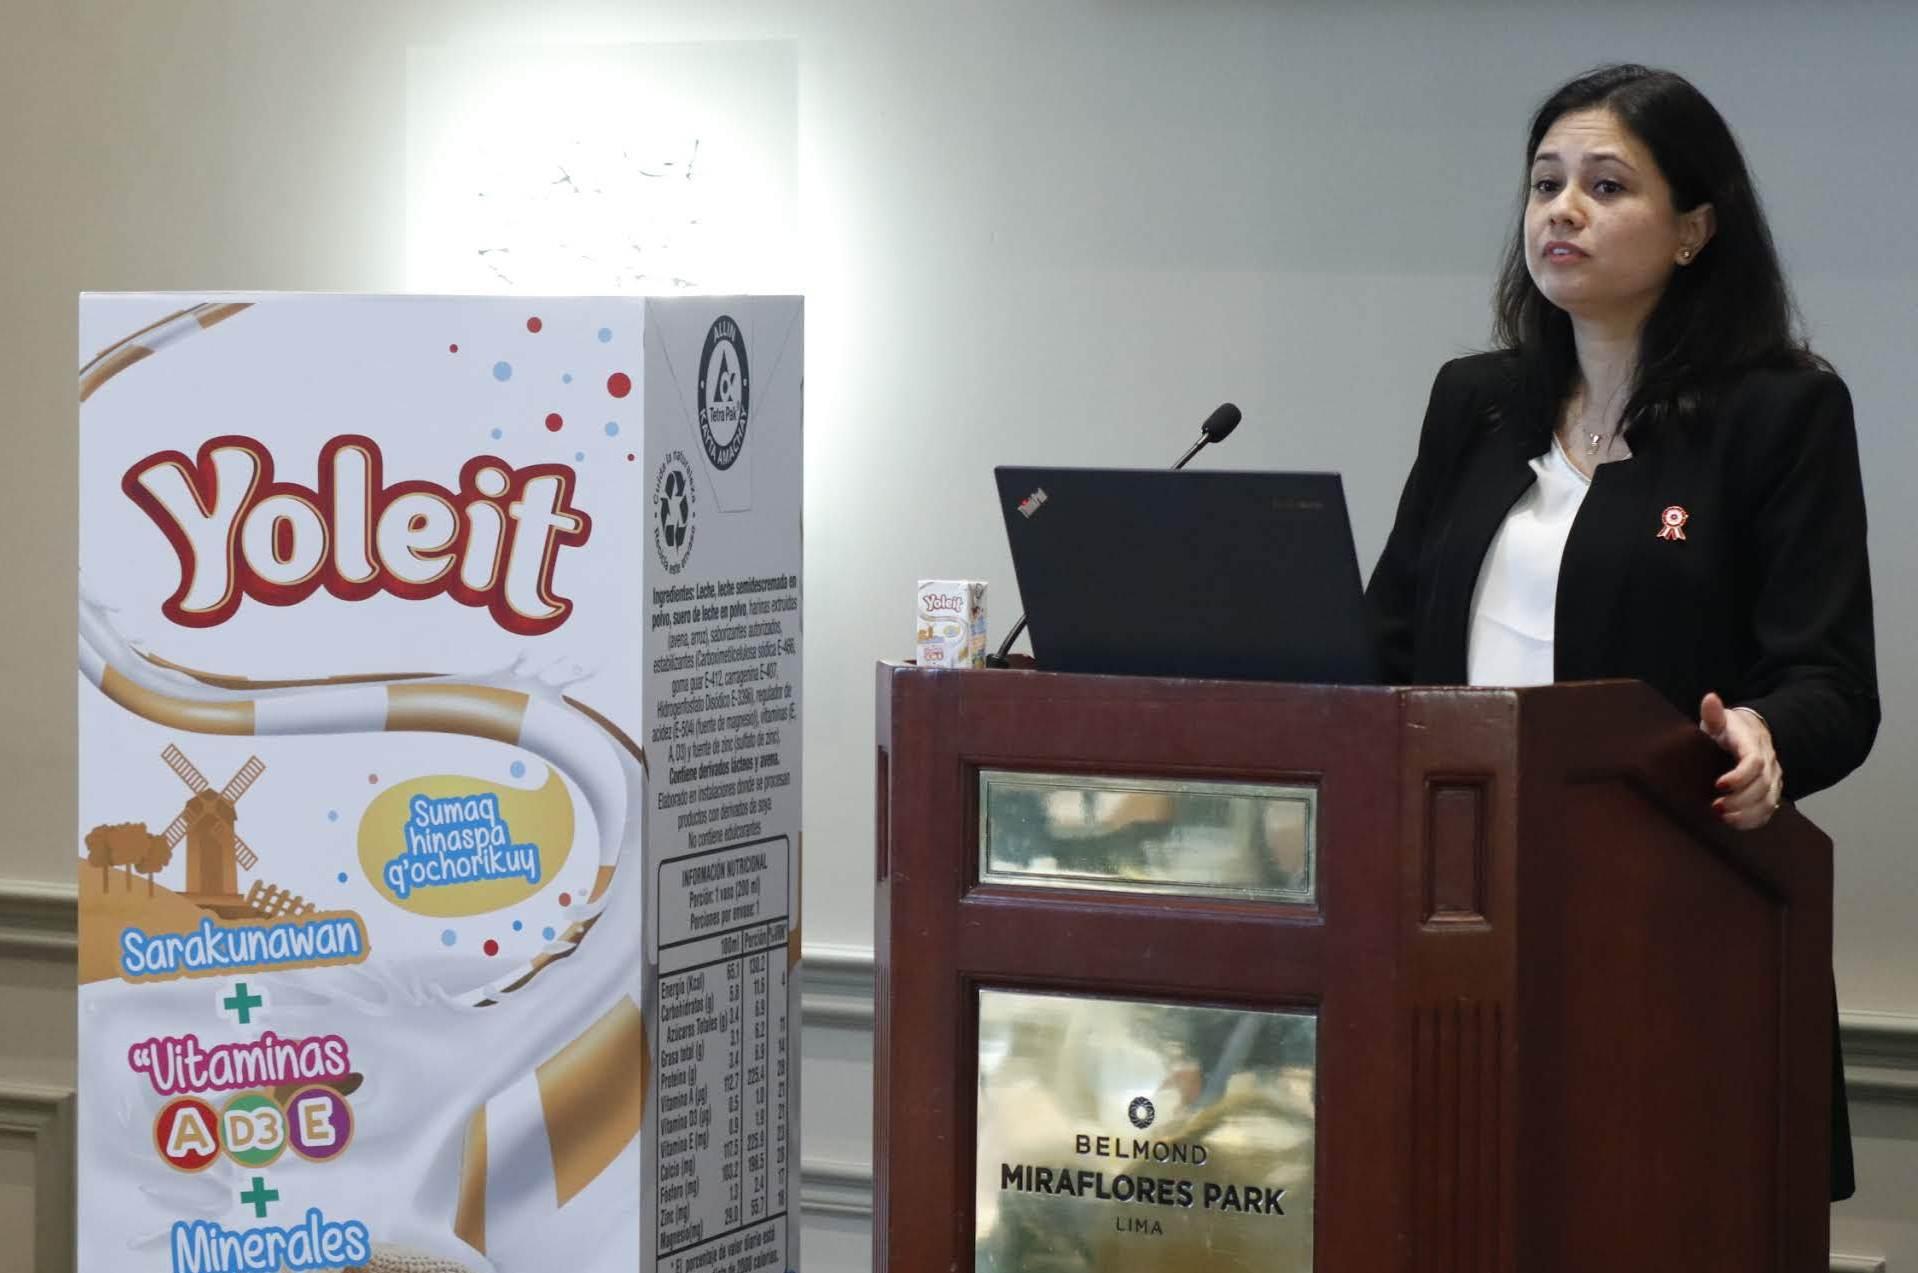 Claudia Flores Gerente de Marketing Lácteos de Andina Alimentos – Yoleit